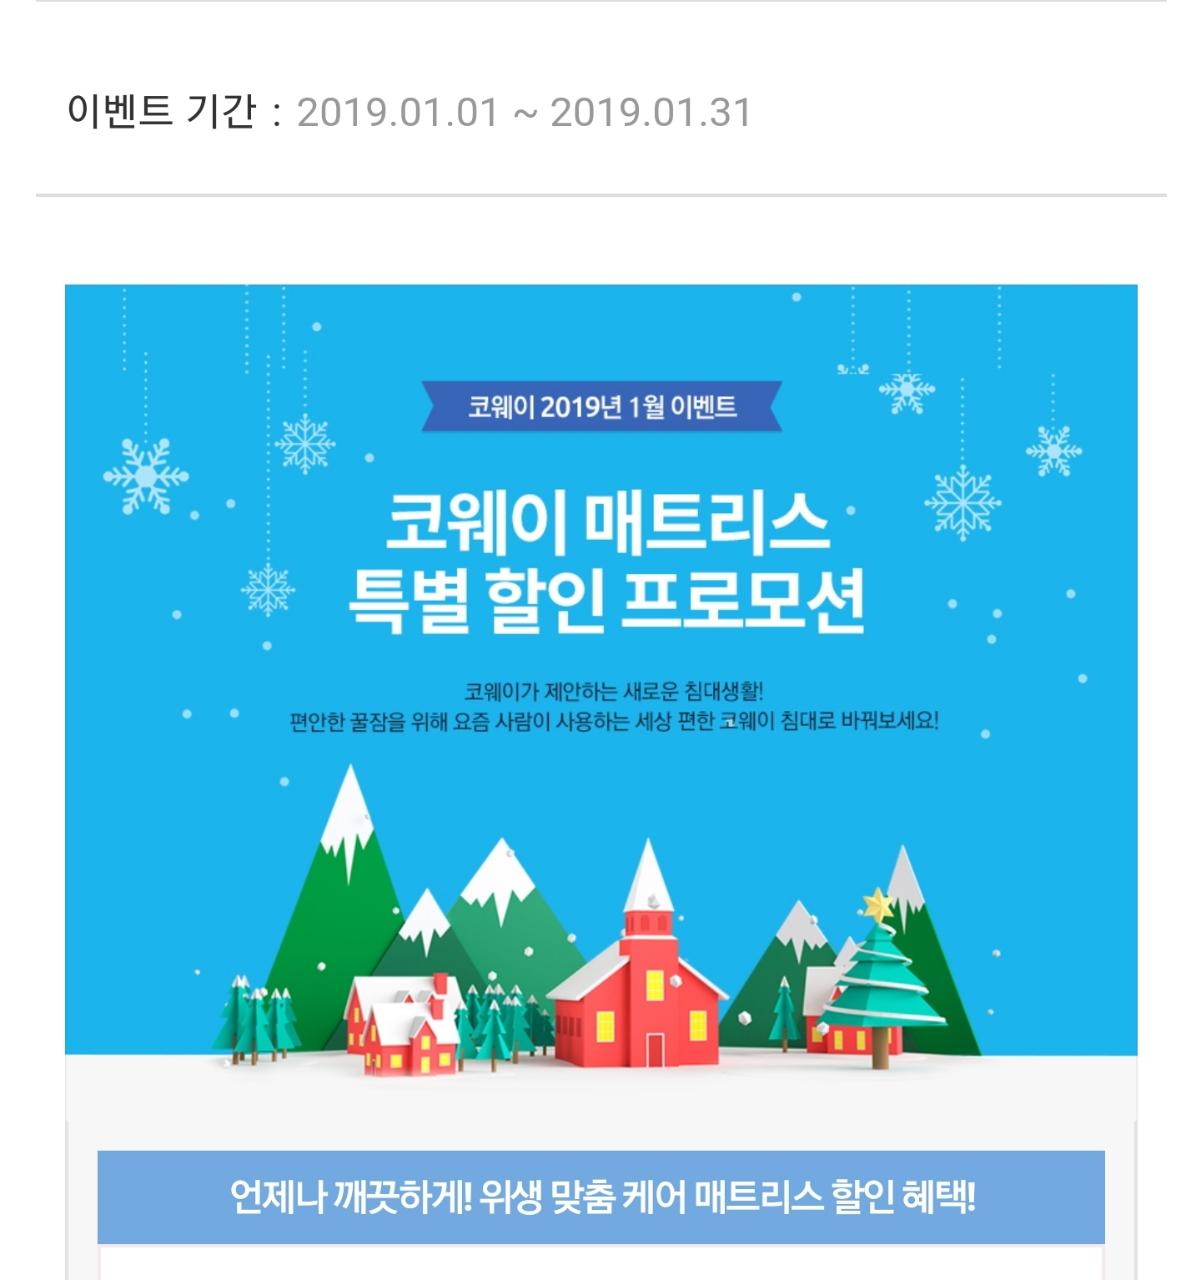 COWAY 코웨이 제주 19년01월 특별하게(!) 해드려요.